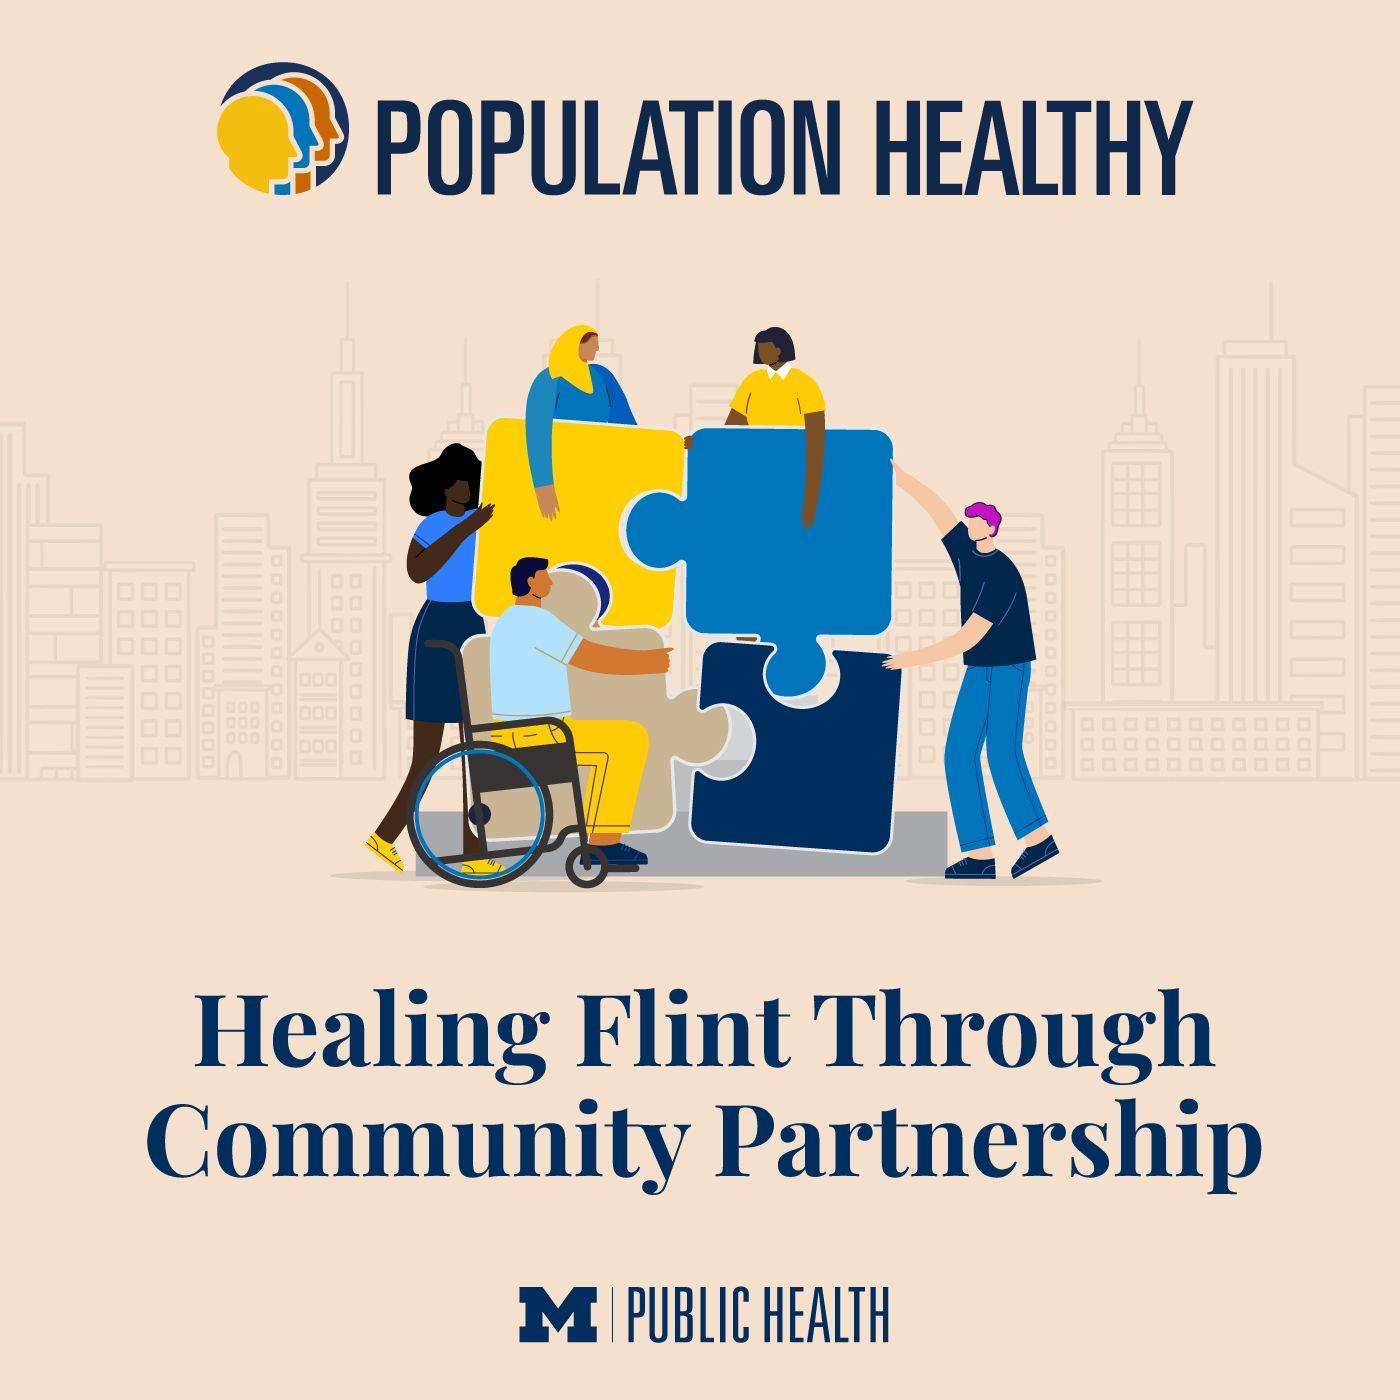 Healing Flint Through Community Partnership